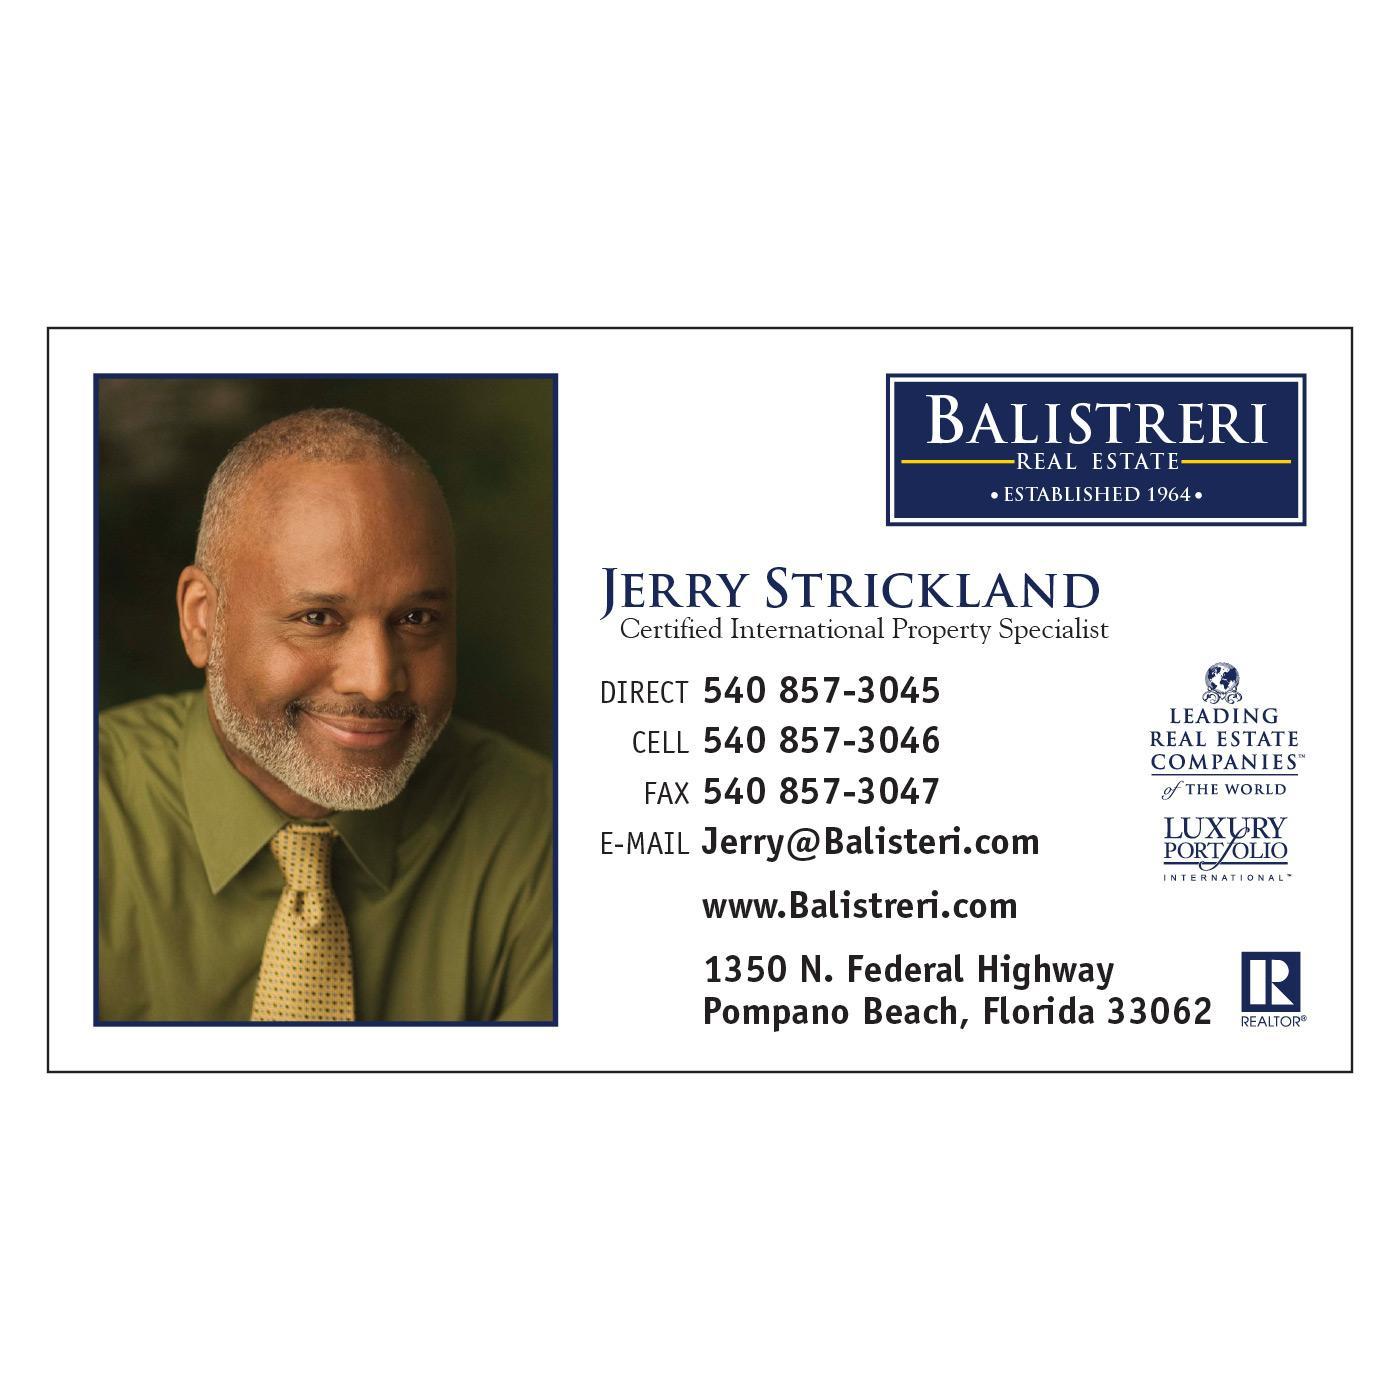 Ballistreri Realty business card